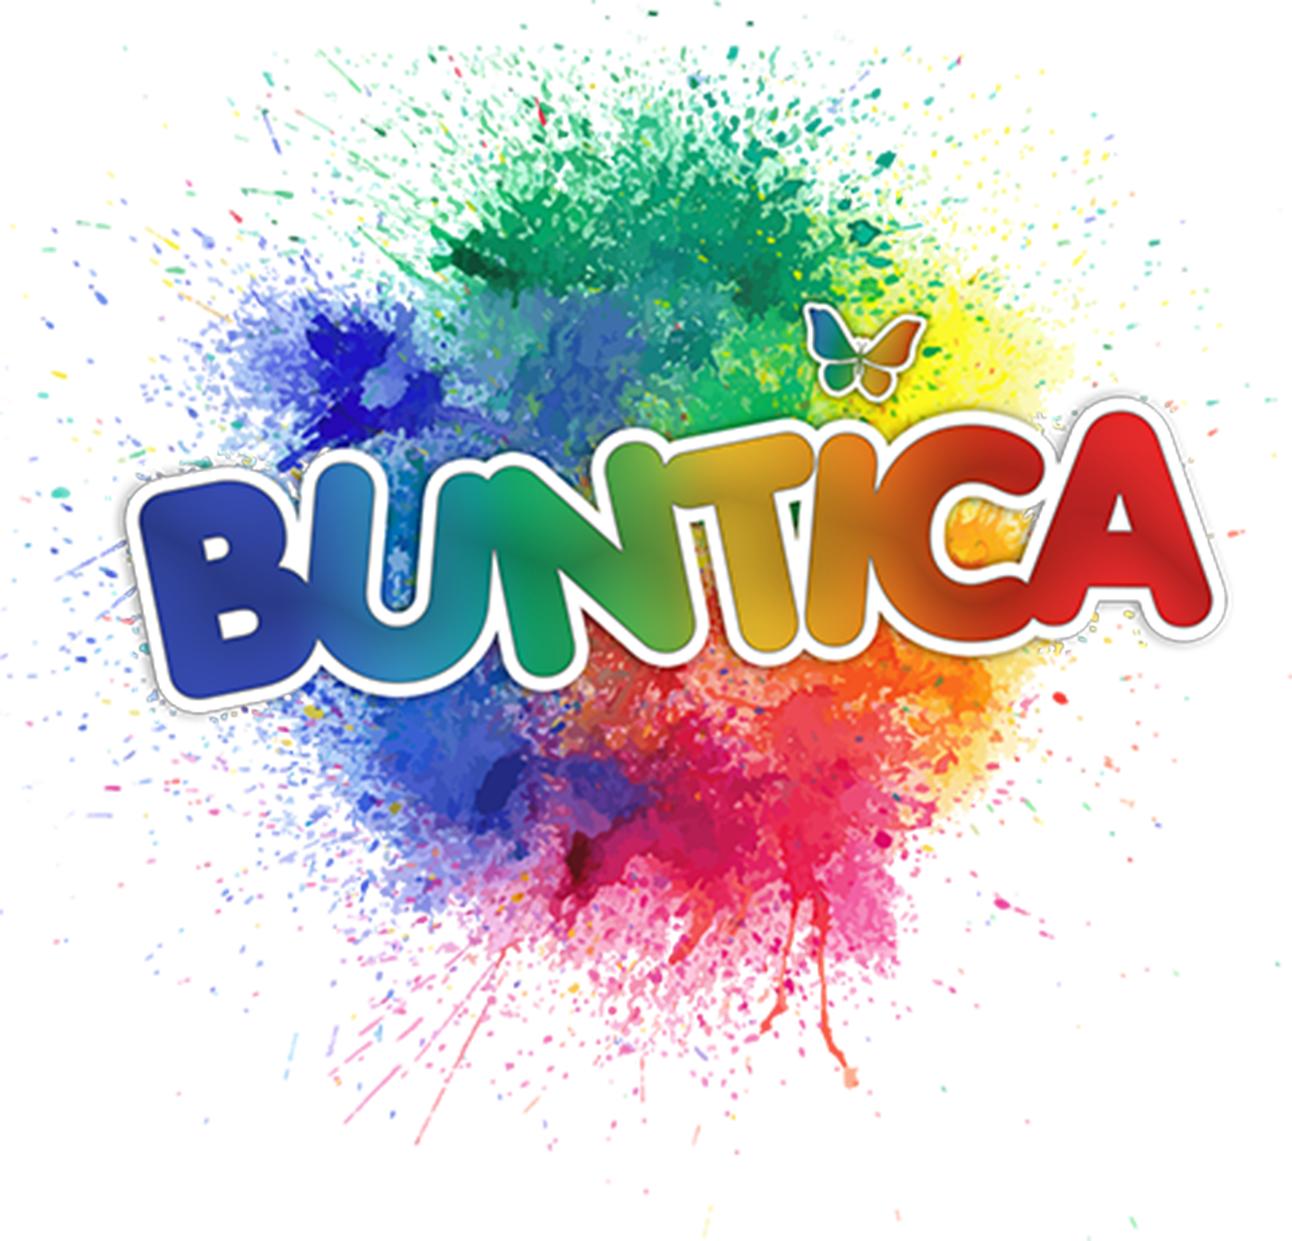 buntica logo